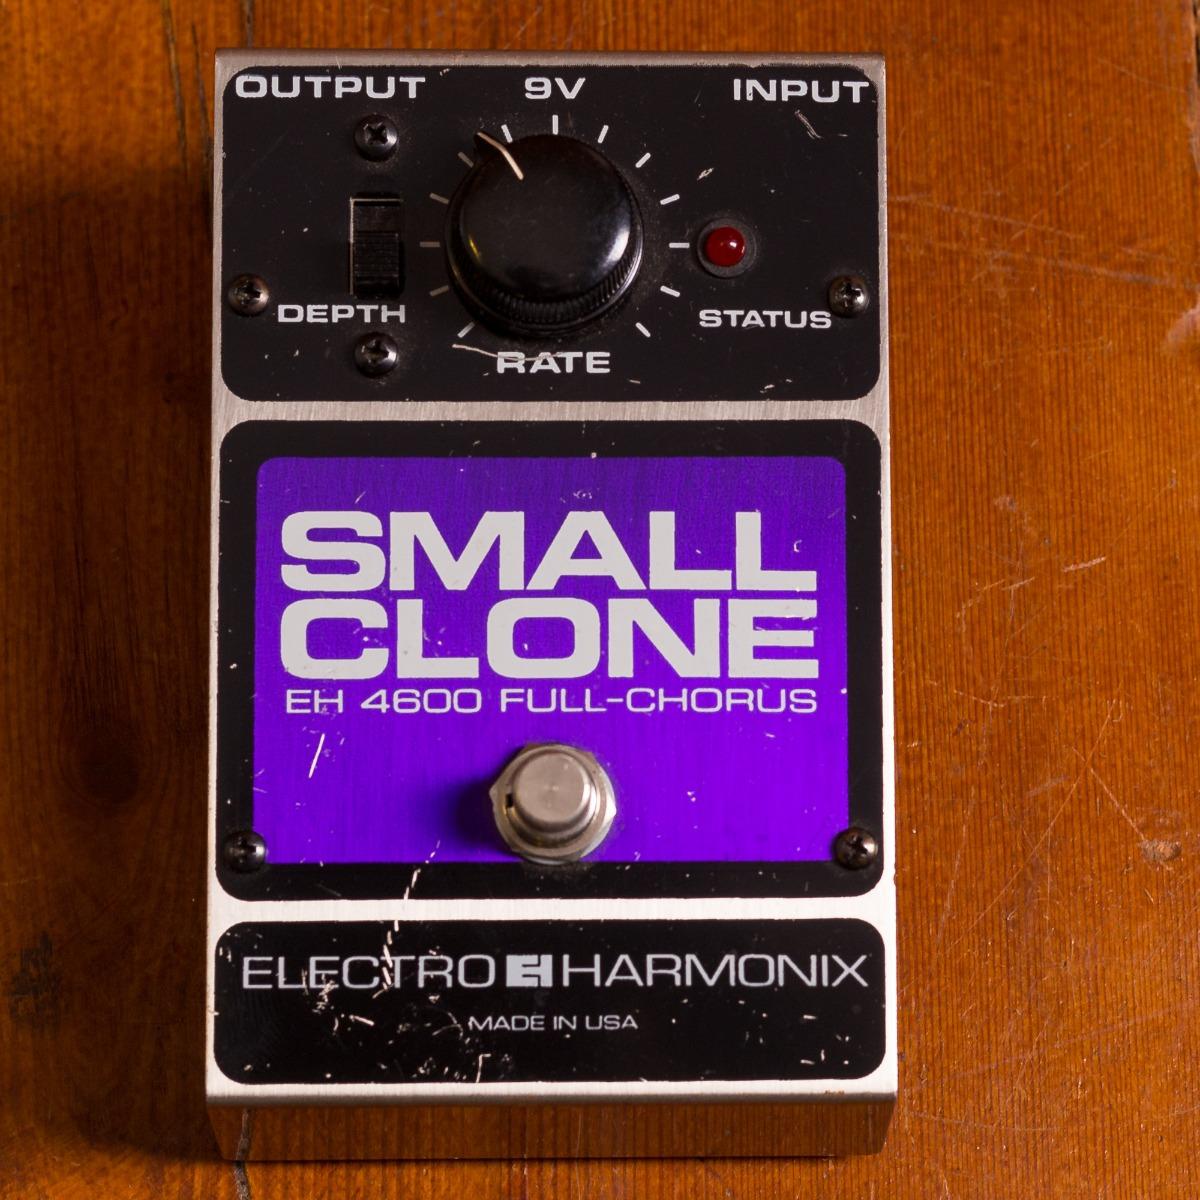 Electro Harmonix Vintage Small Clone EH4600 sfull Chorus